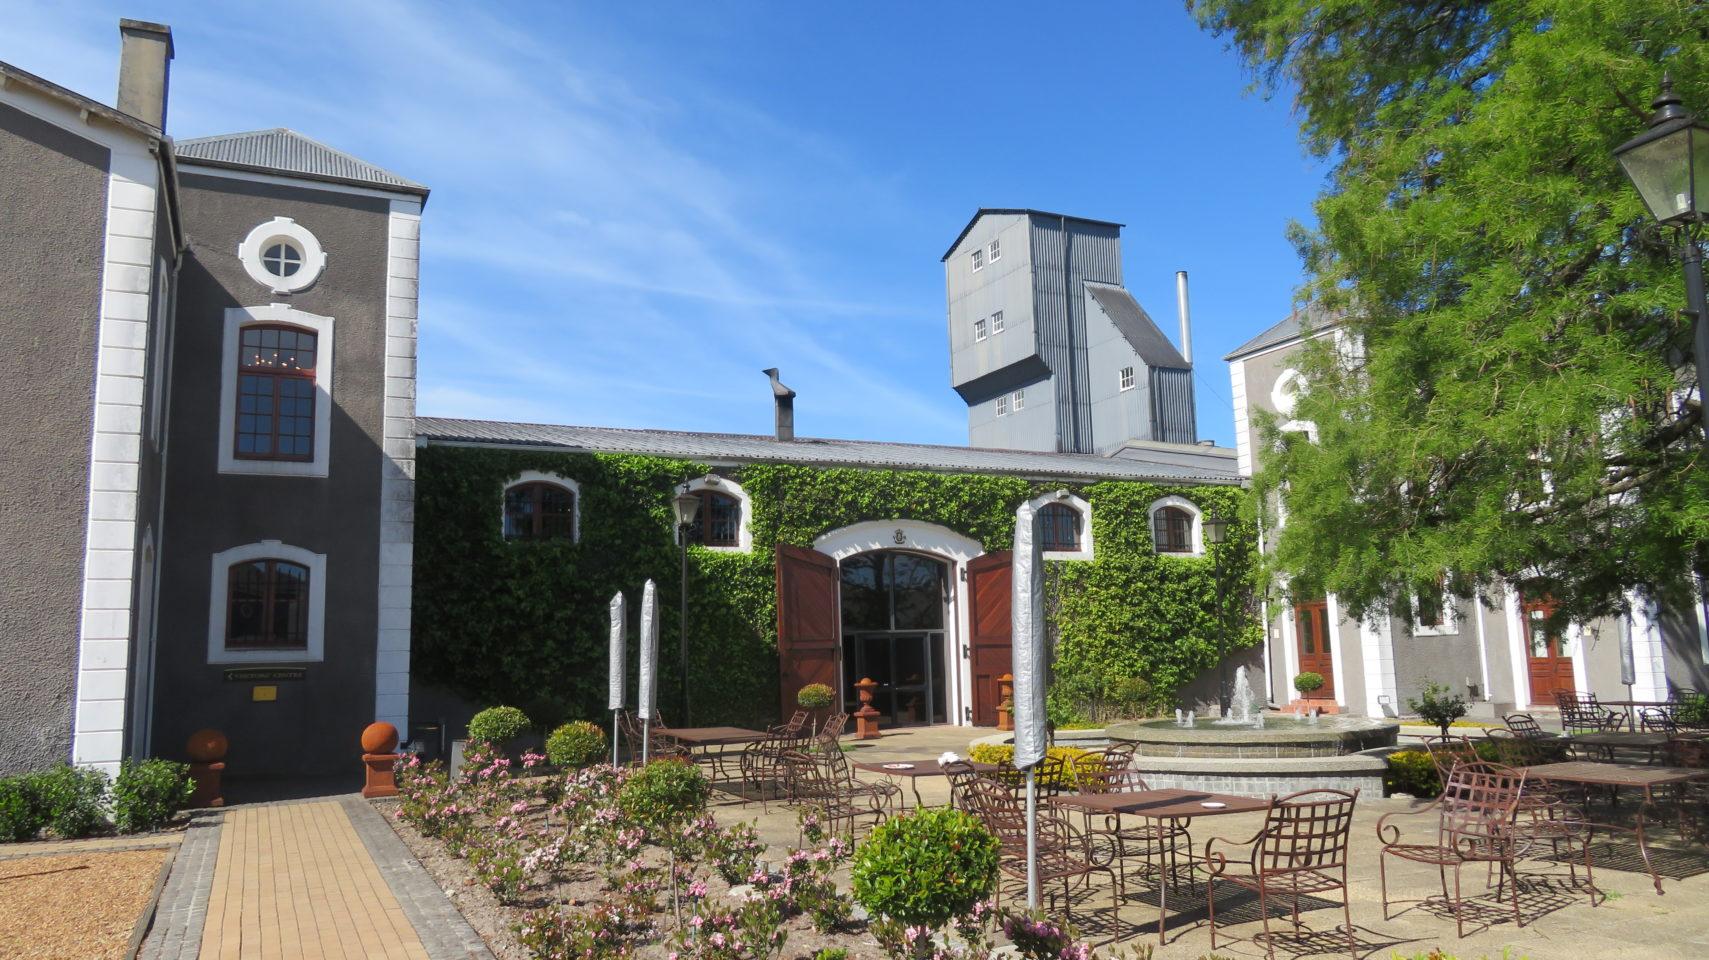 Van Ryn's Distillery in Stellenbosch, South Africa